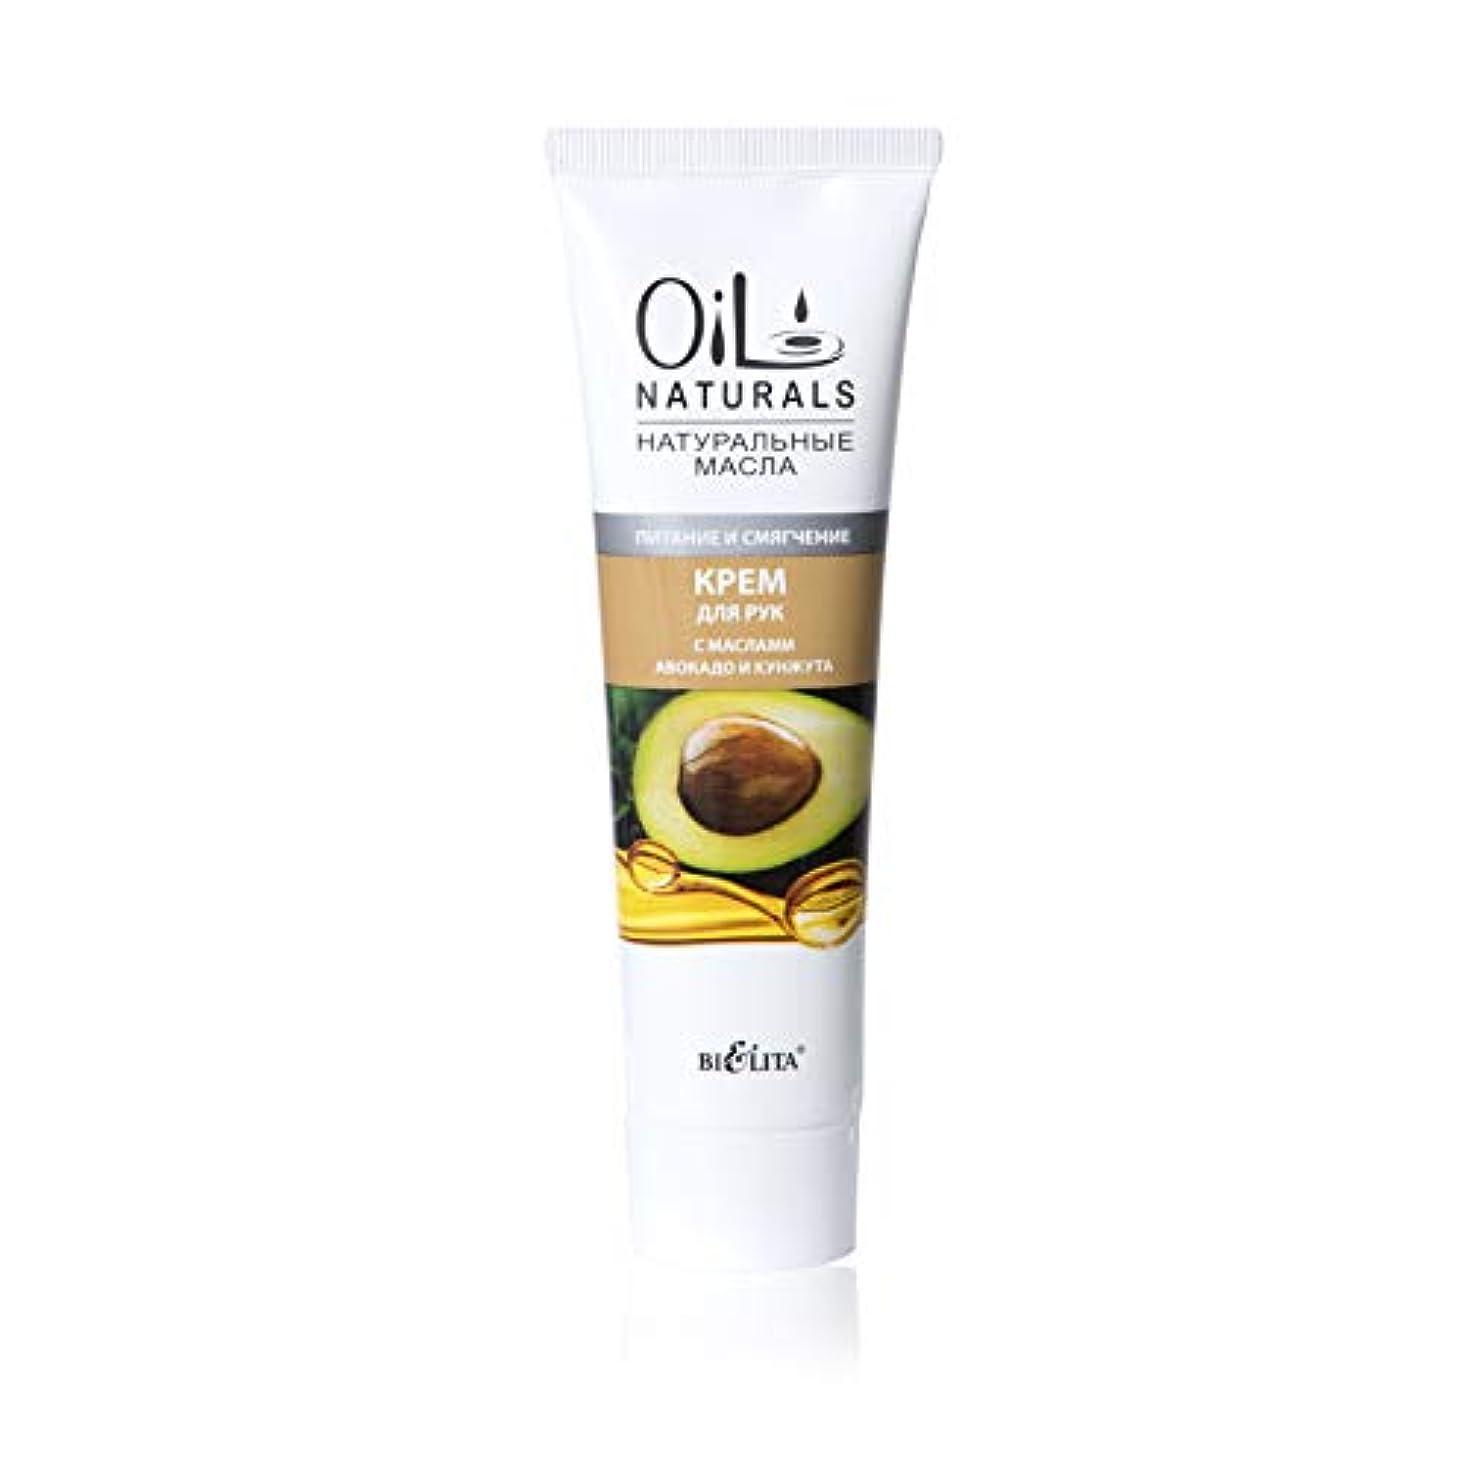 手独創的粘着性Bielita & Vitex Oil Naturals Line | Nutrition & Softening Hand Cream, 100 ml | Avocado Oil, Silk Proteins, Sesame...